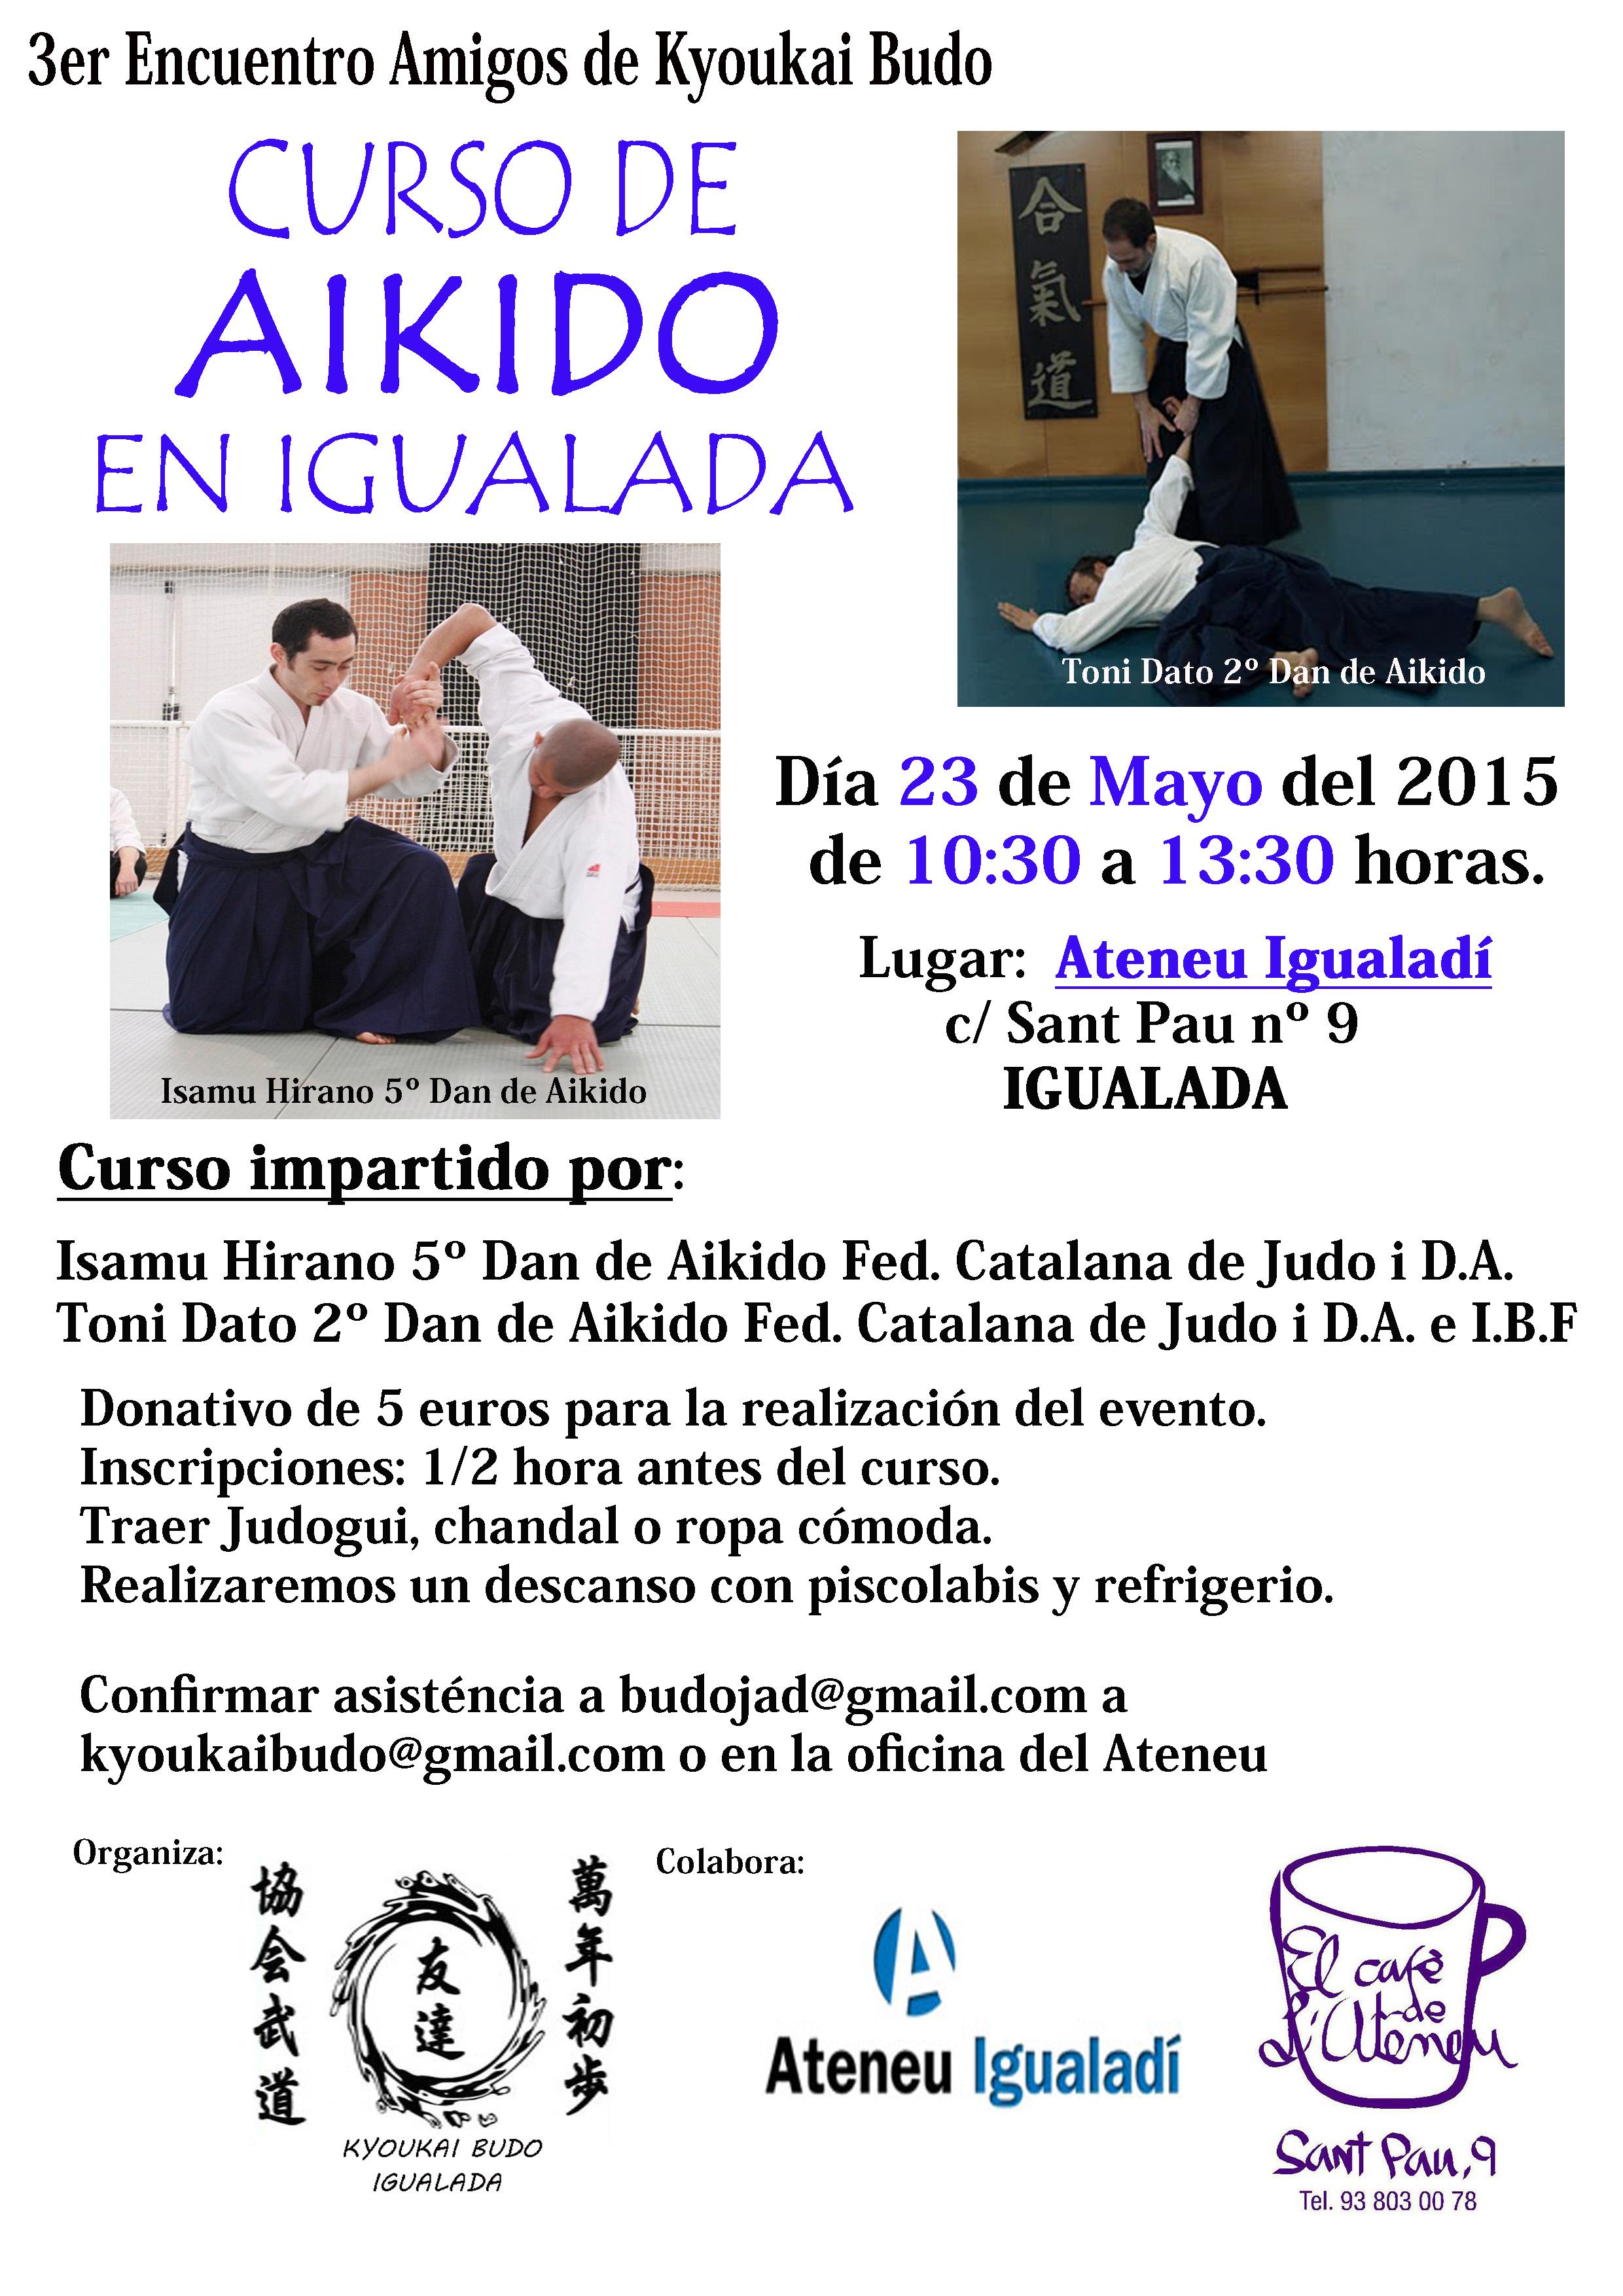 Curso Aikido Mayo Igualada 2015 copia